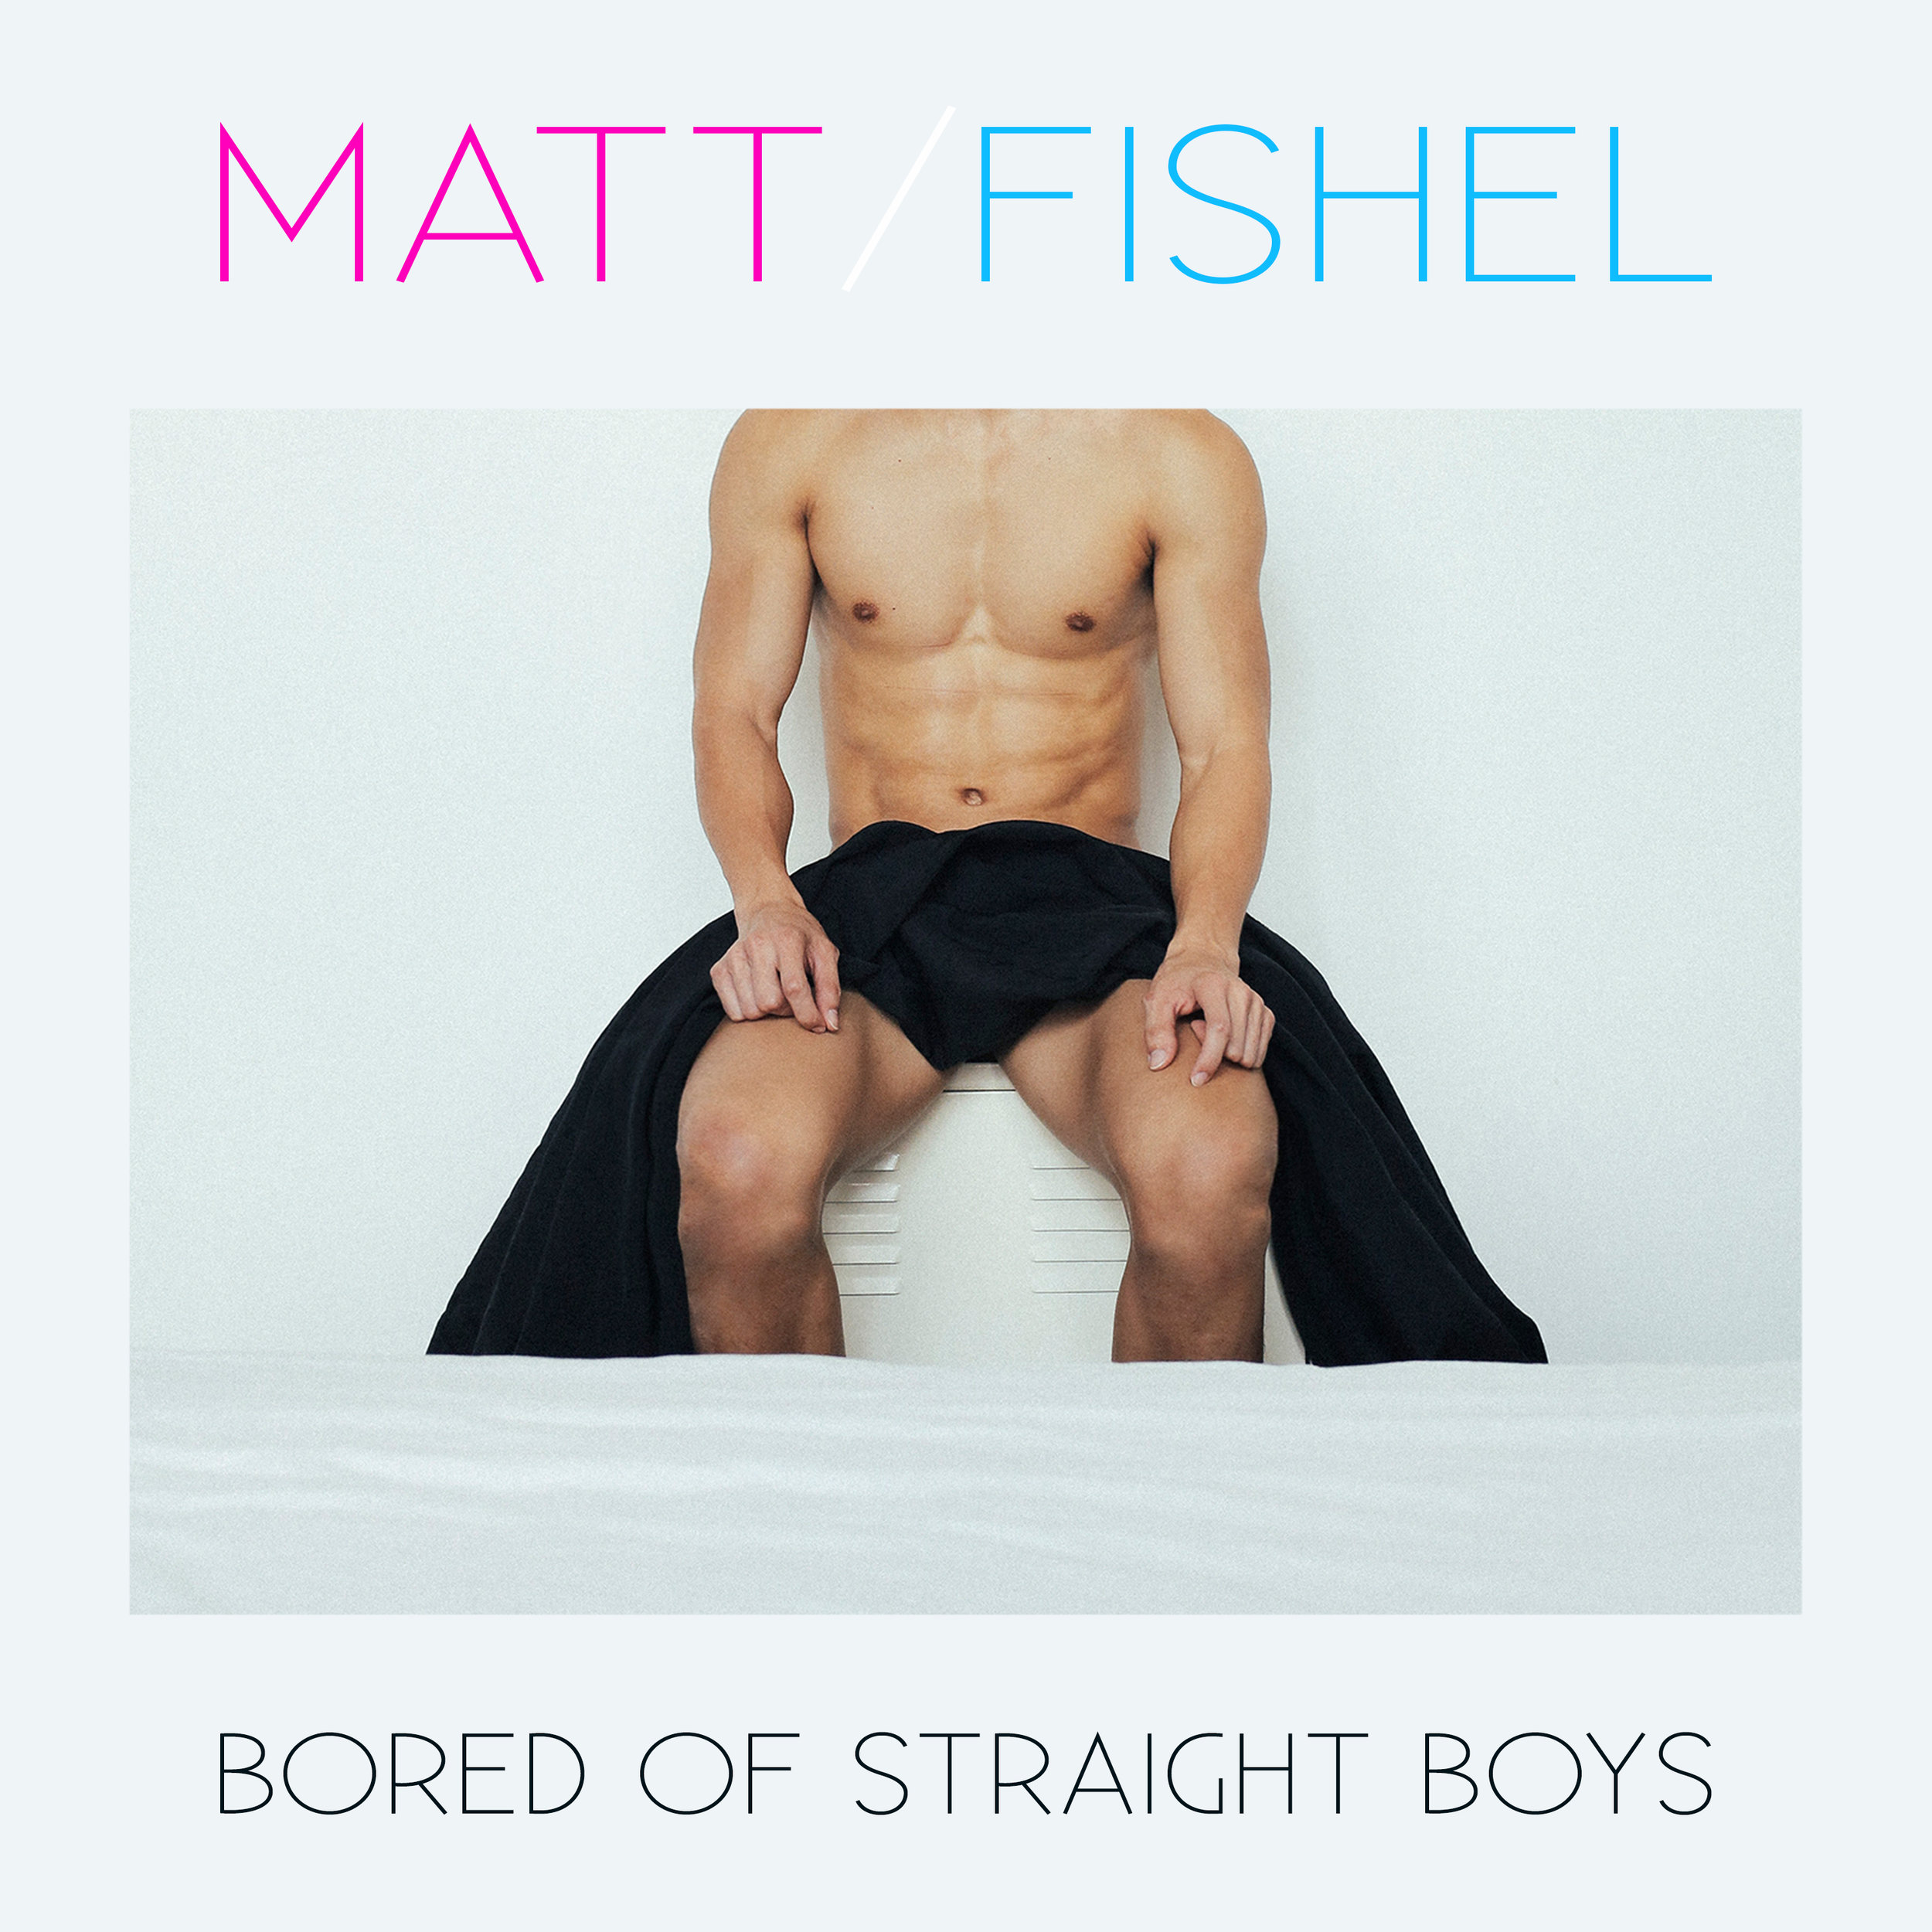 Bored Of Straight Boys 00 Single Cover.jpg